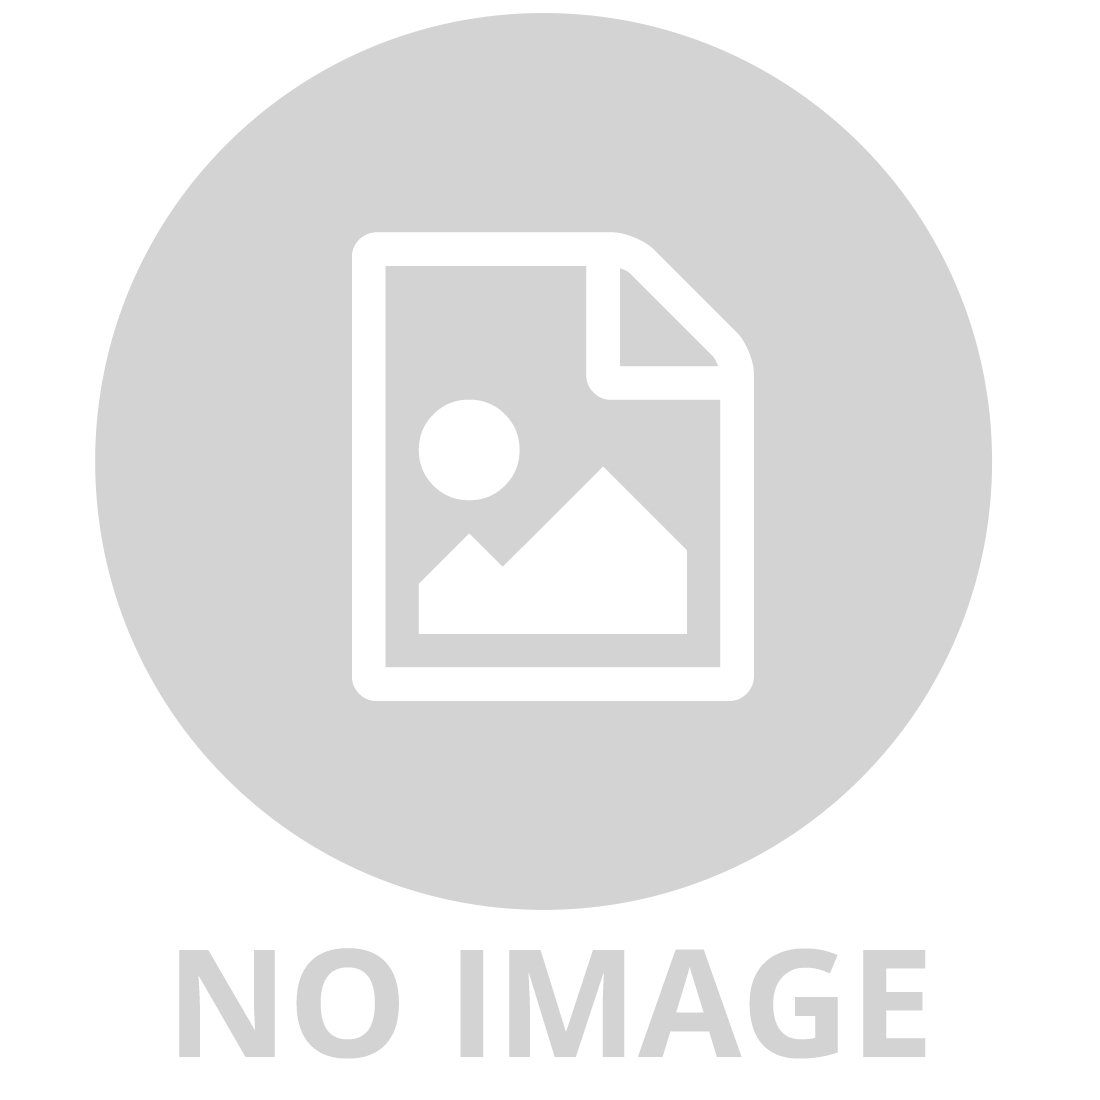 MELISSA & DOUG LITTLE CHEF CLOTH BOOK